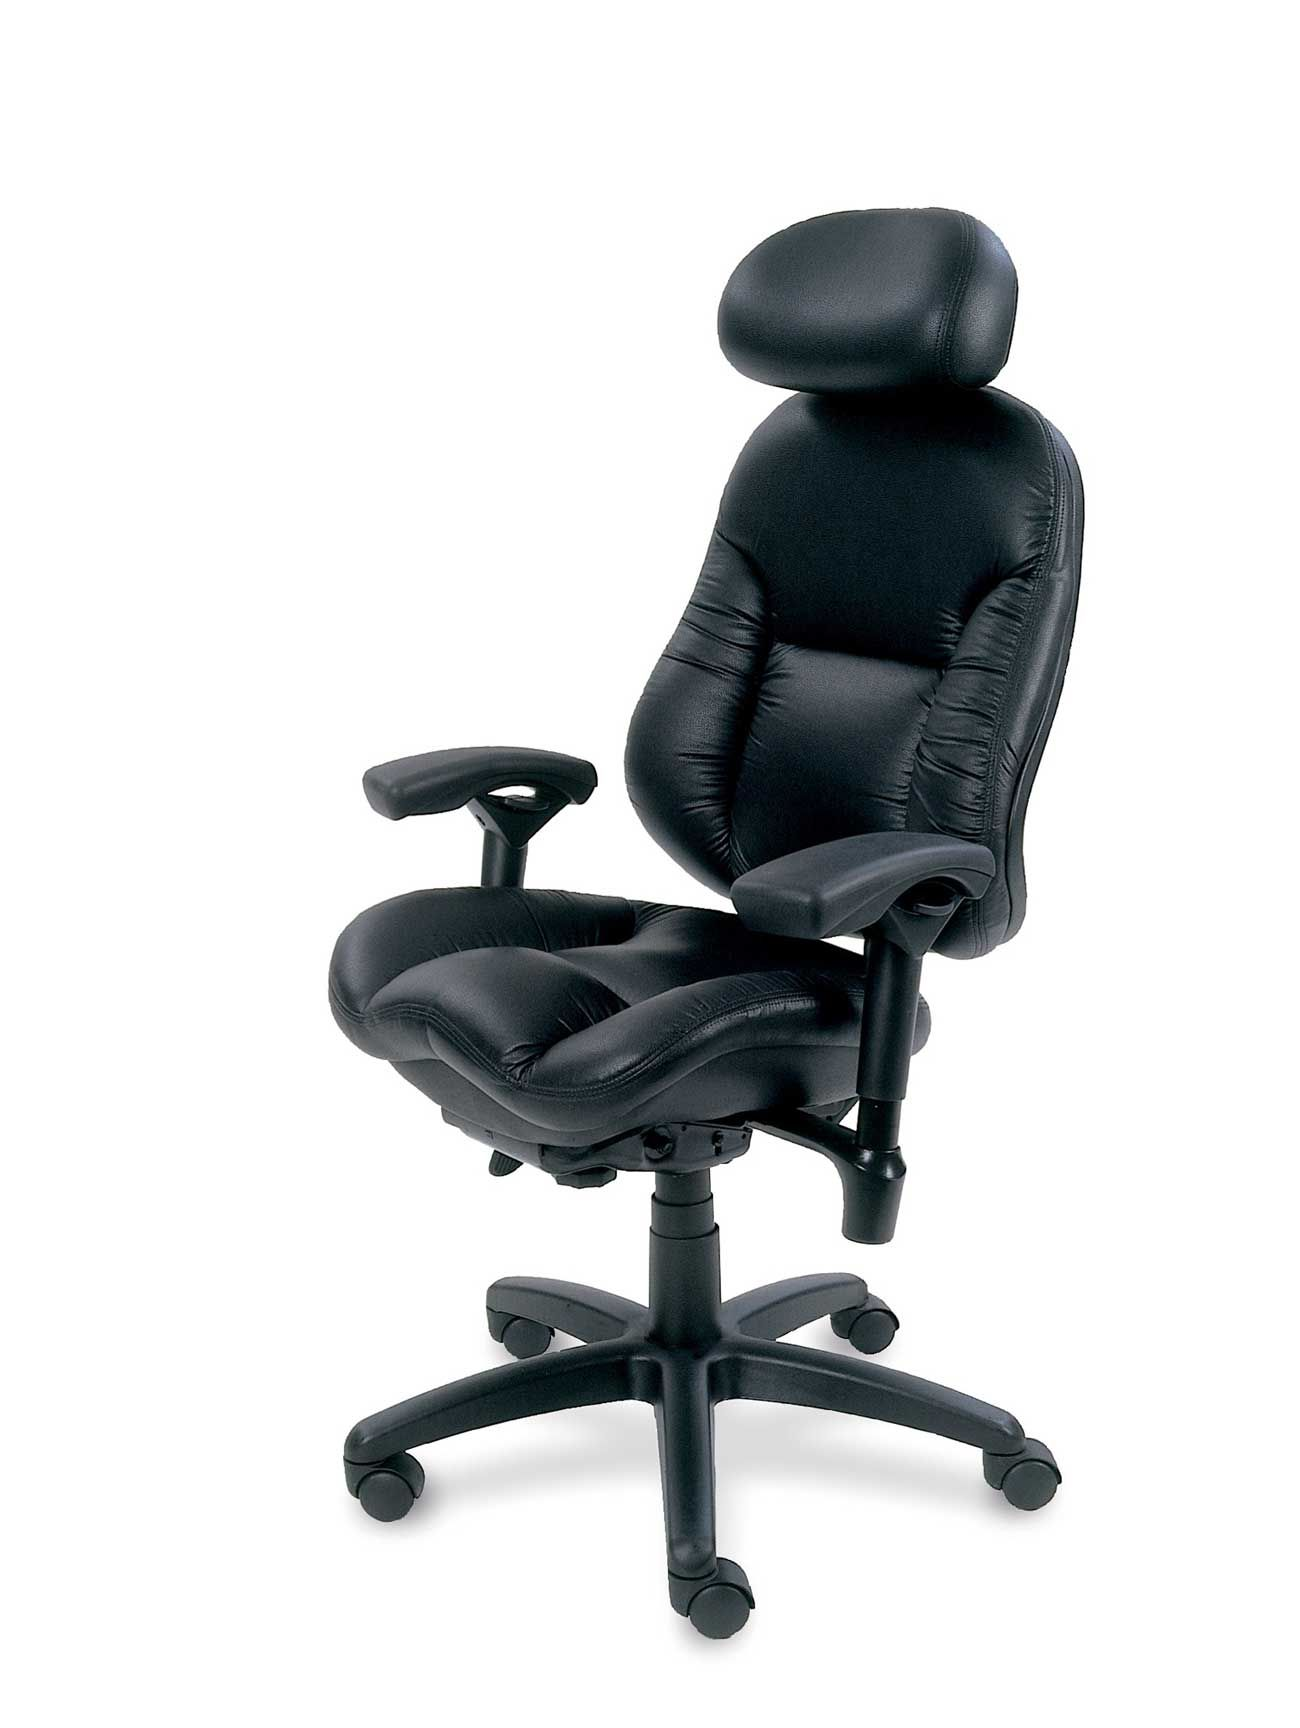 Bodybilt Black Leather Ergonomic Desktop Chair Office Chair Comfortable Computer Chair Ergonomic Desk Chair